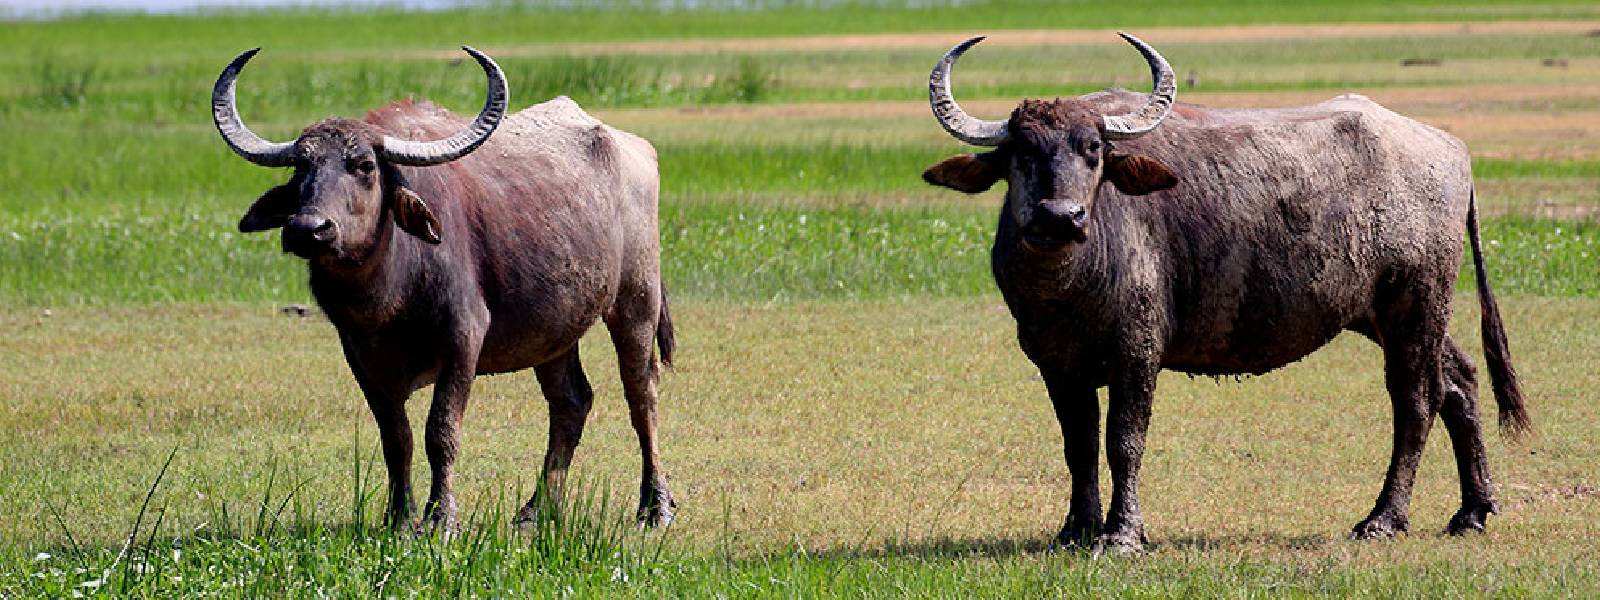 Buffaloes die of unidentified disease in Polonnaruwa